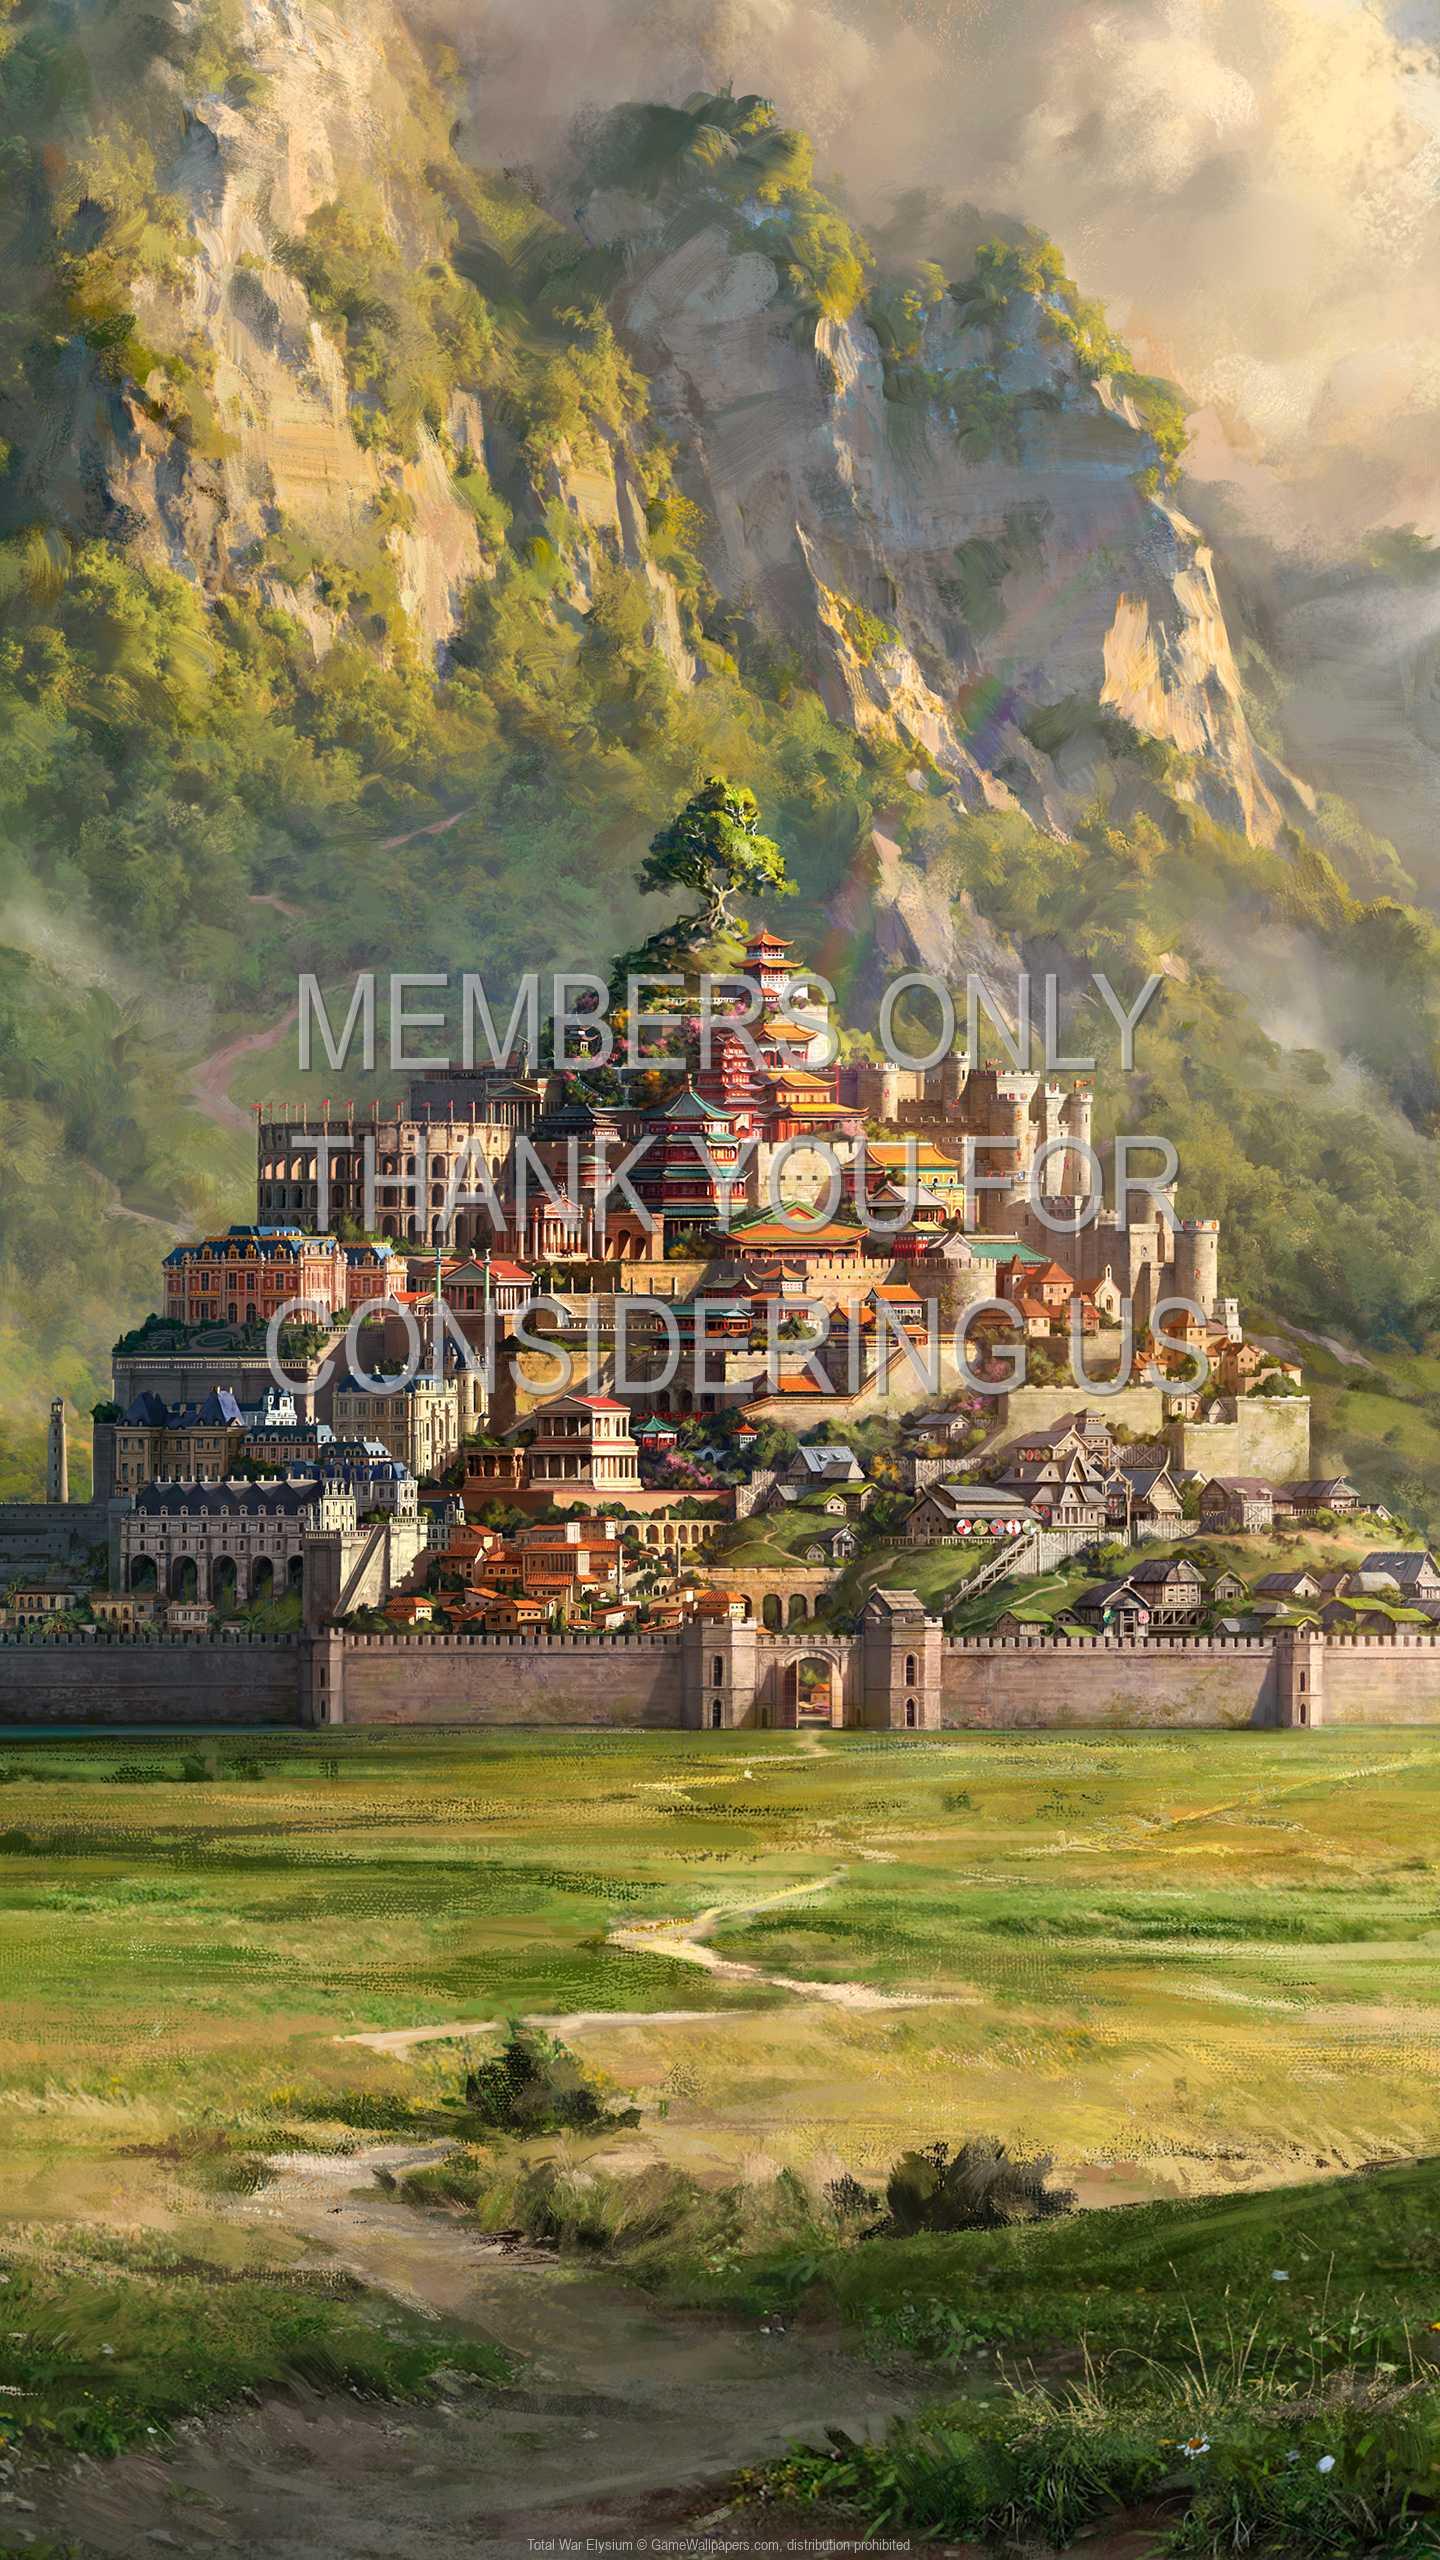 Total War: Elysium 1440p Vertical Mobile wallpaper or background 02